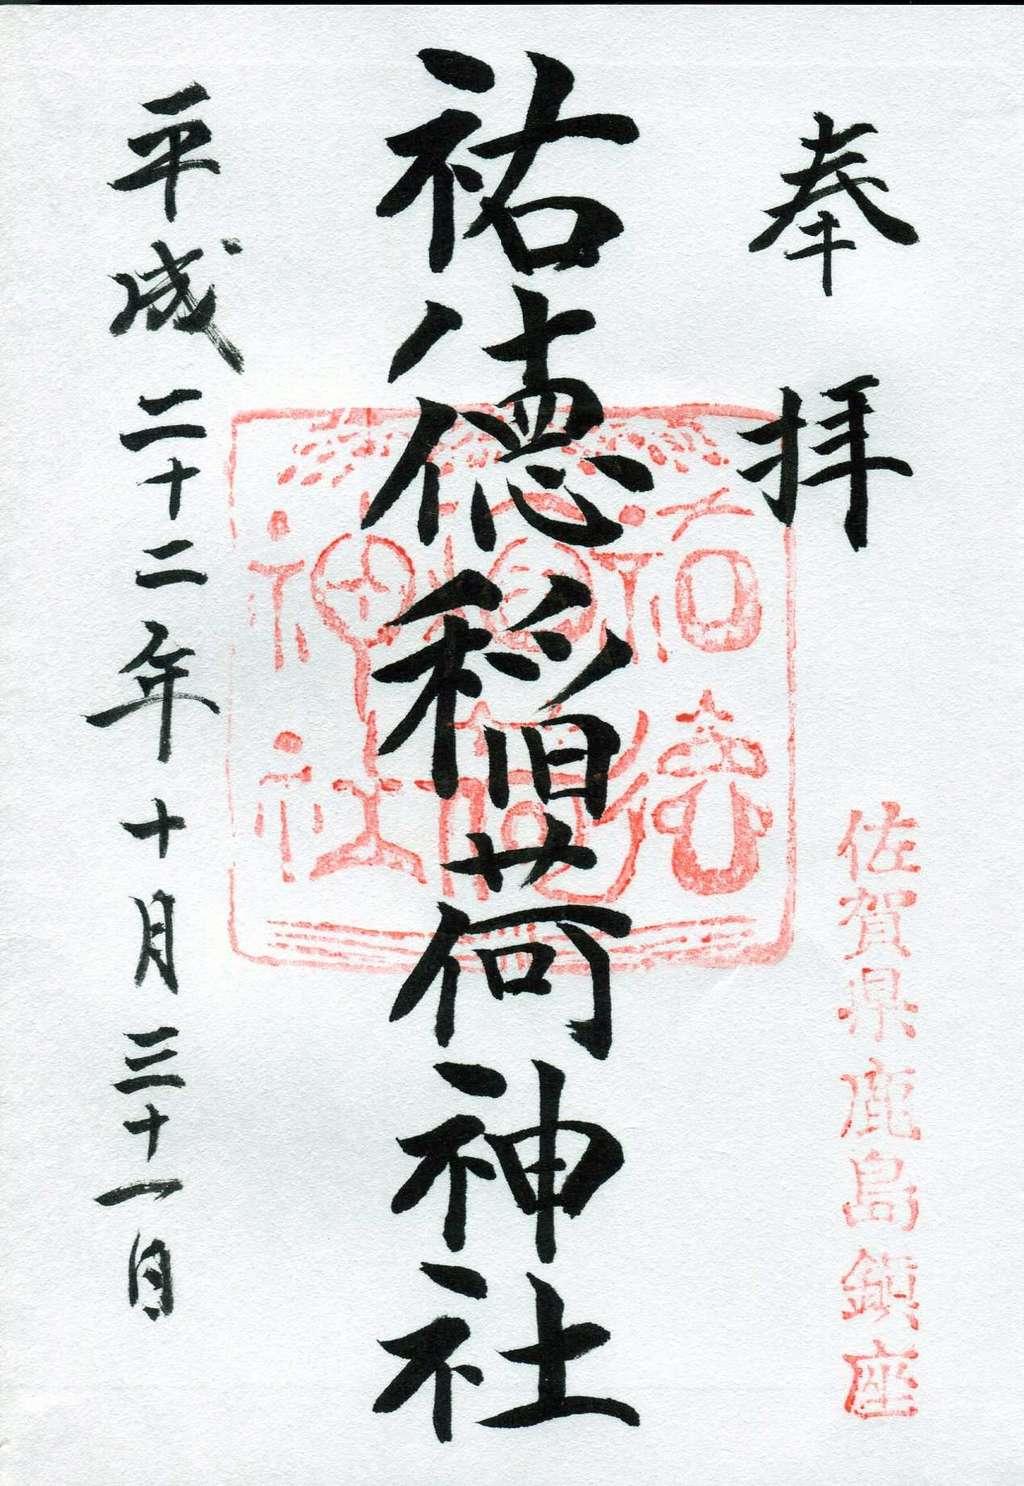 祐徳稲荷神社の御朱印